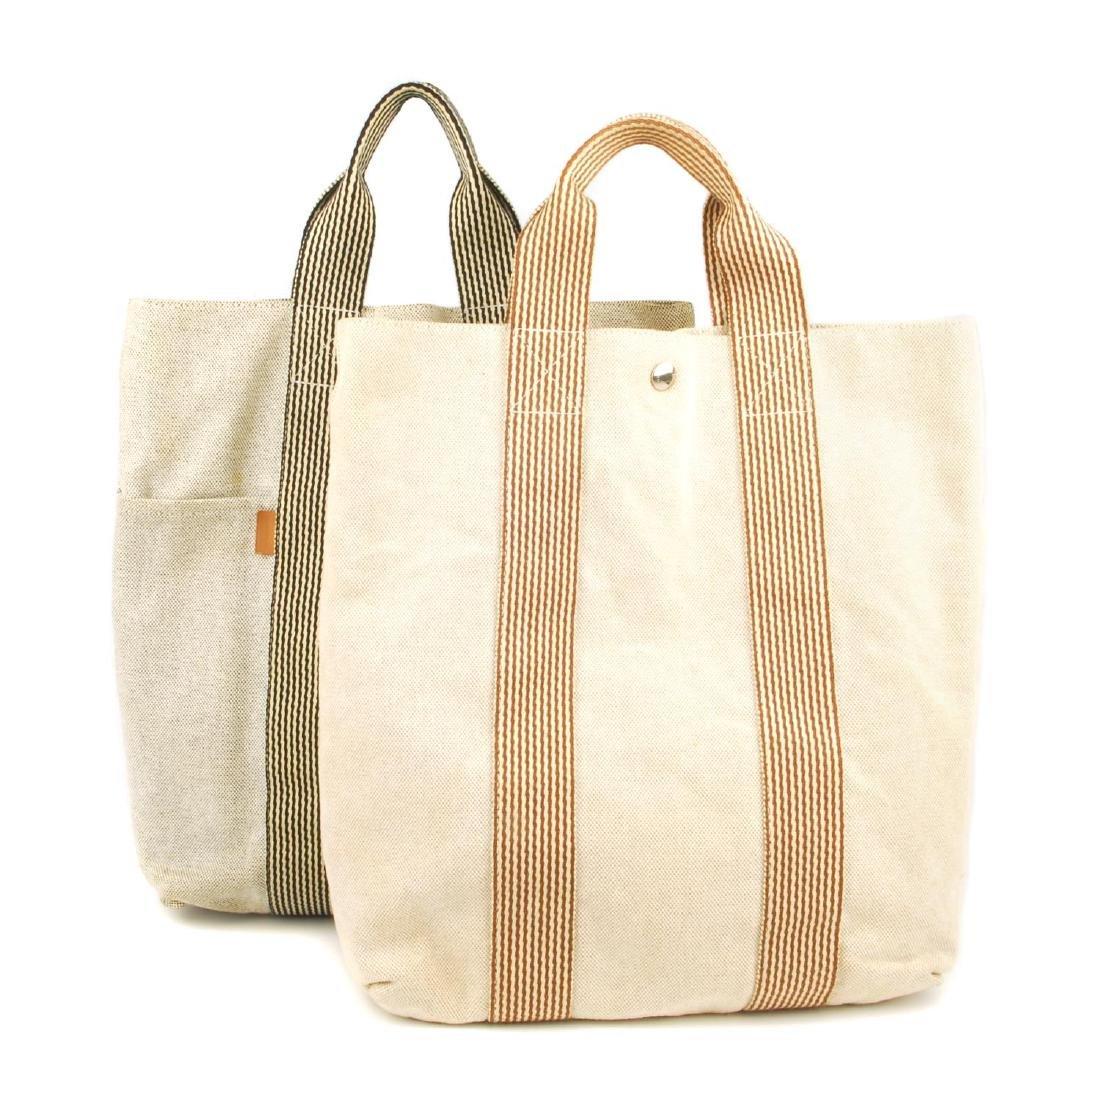 HERMÈS - two Fourre Tout canvas handbags. Both of a